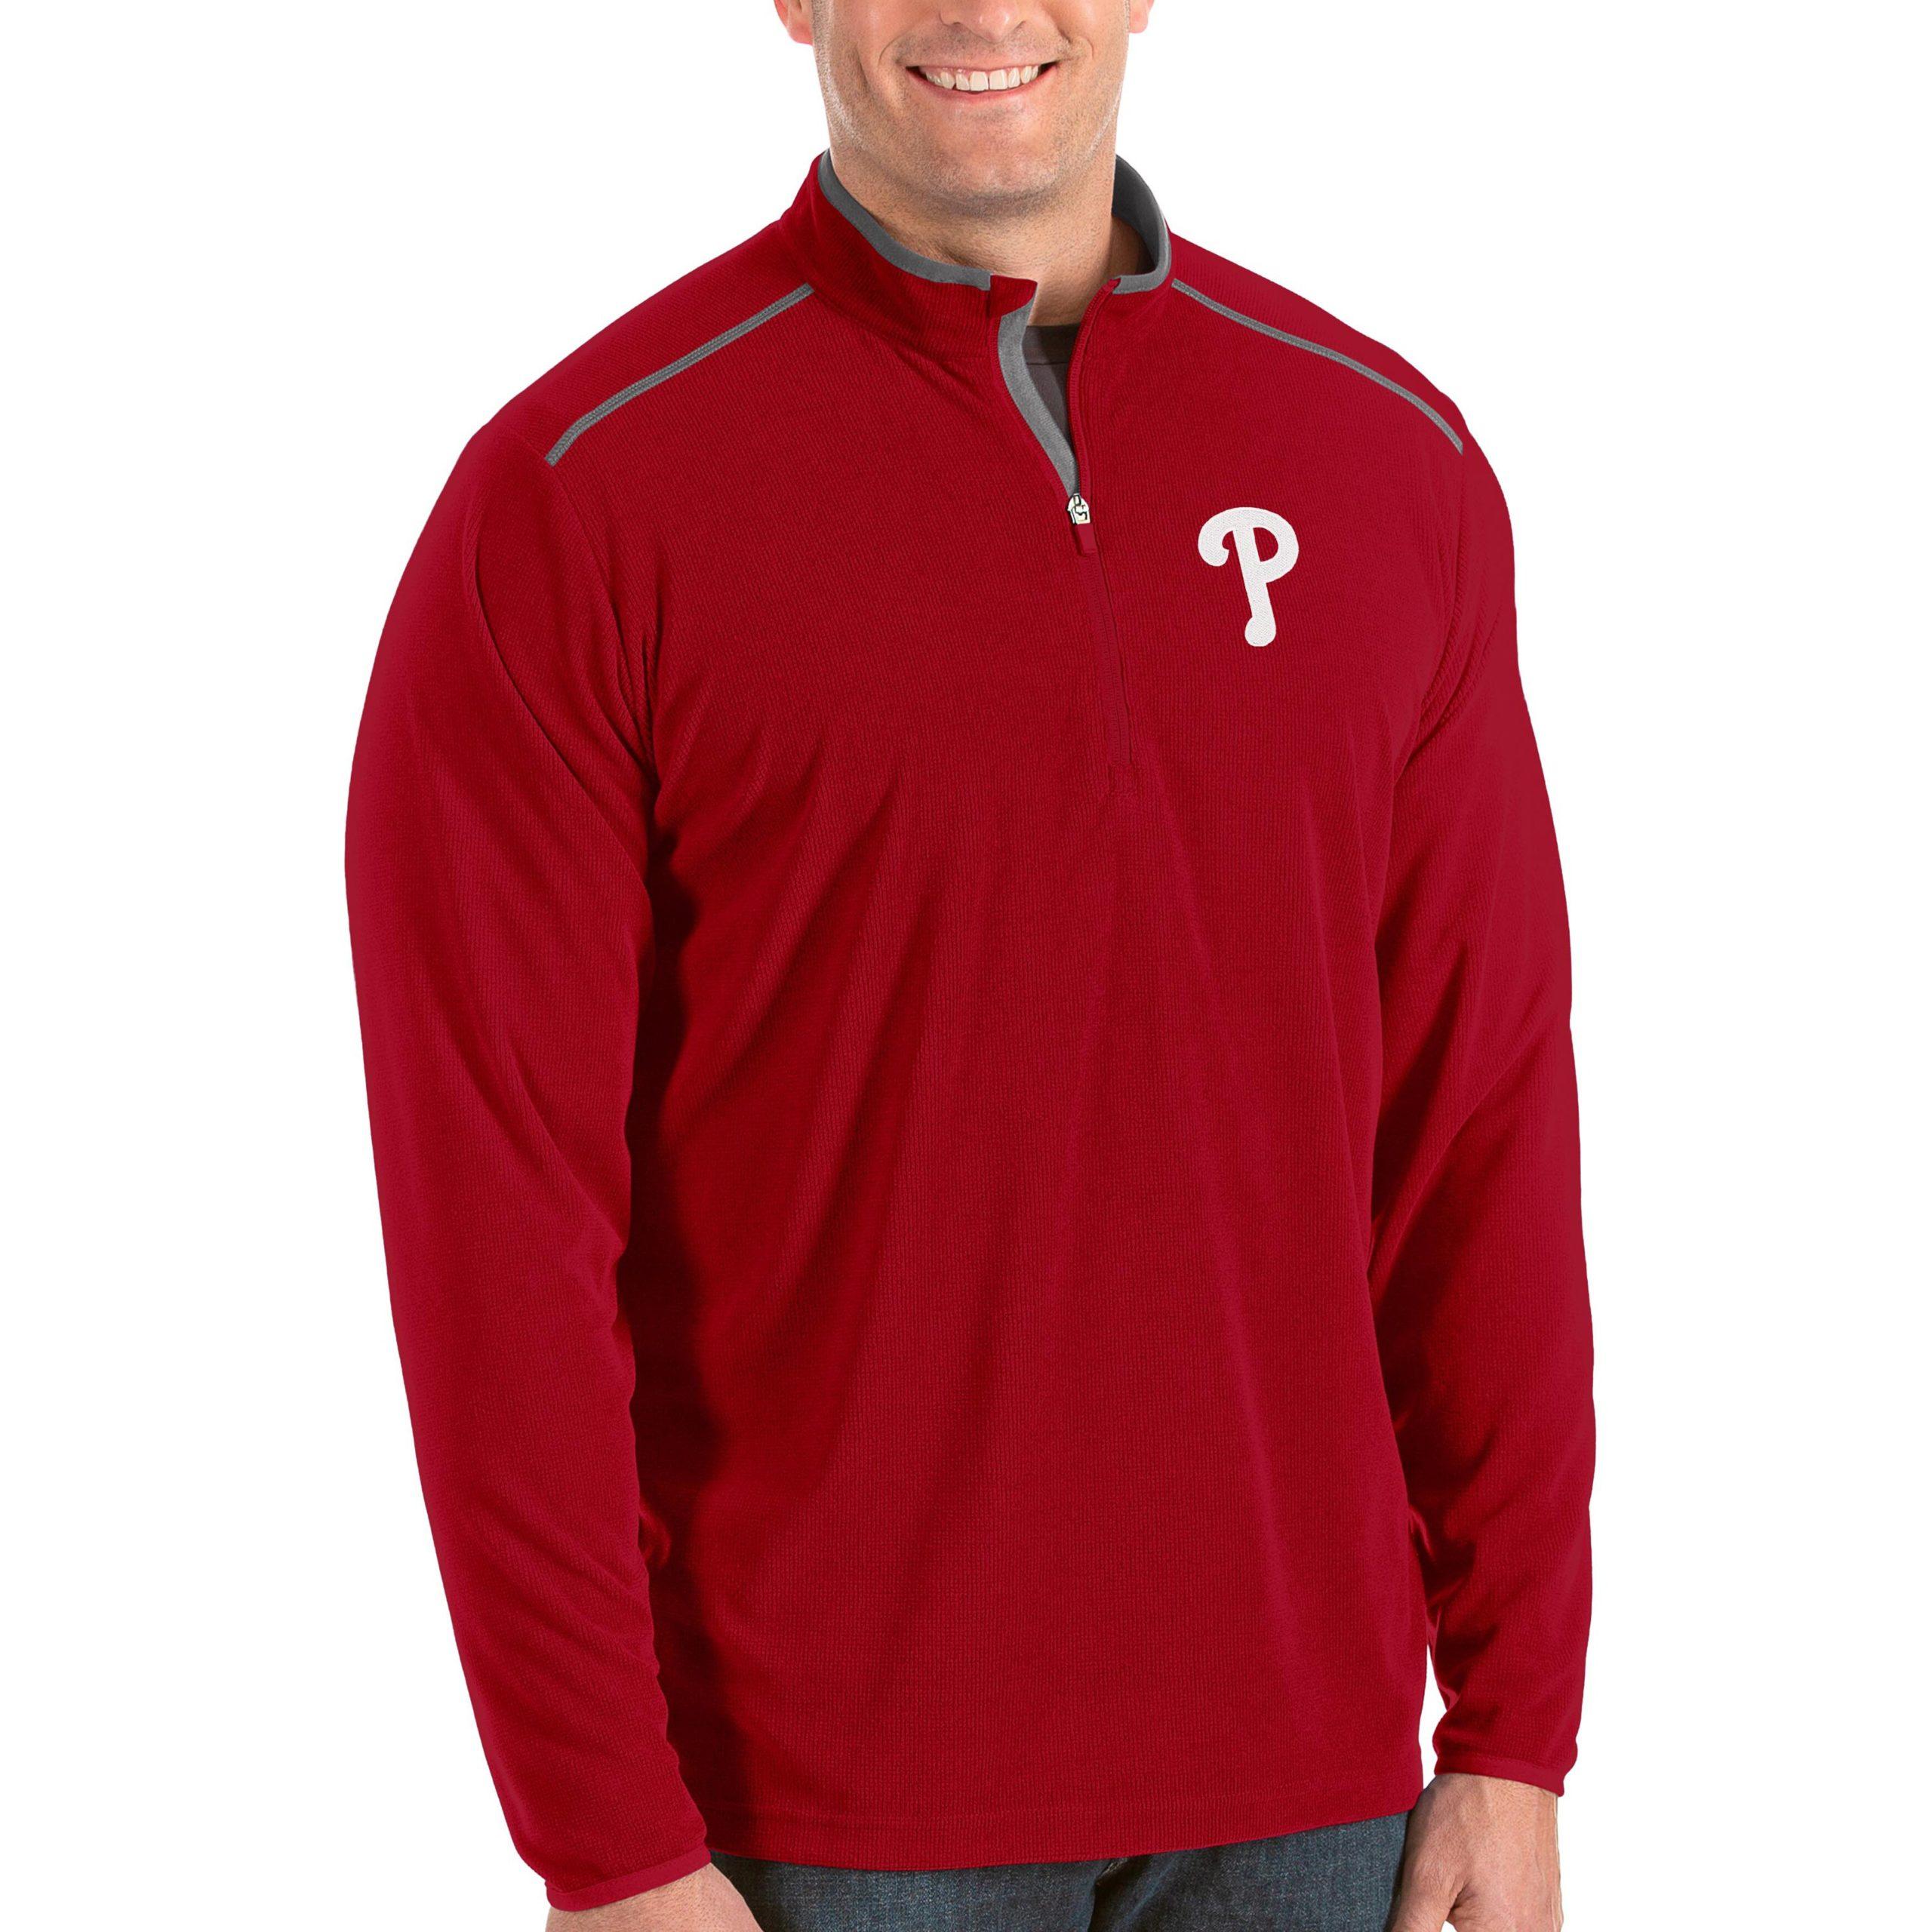 Philadelphia Phillies Antigua Big & Tall Glacier Quarter-Zip Pullover Jacket - Red